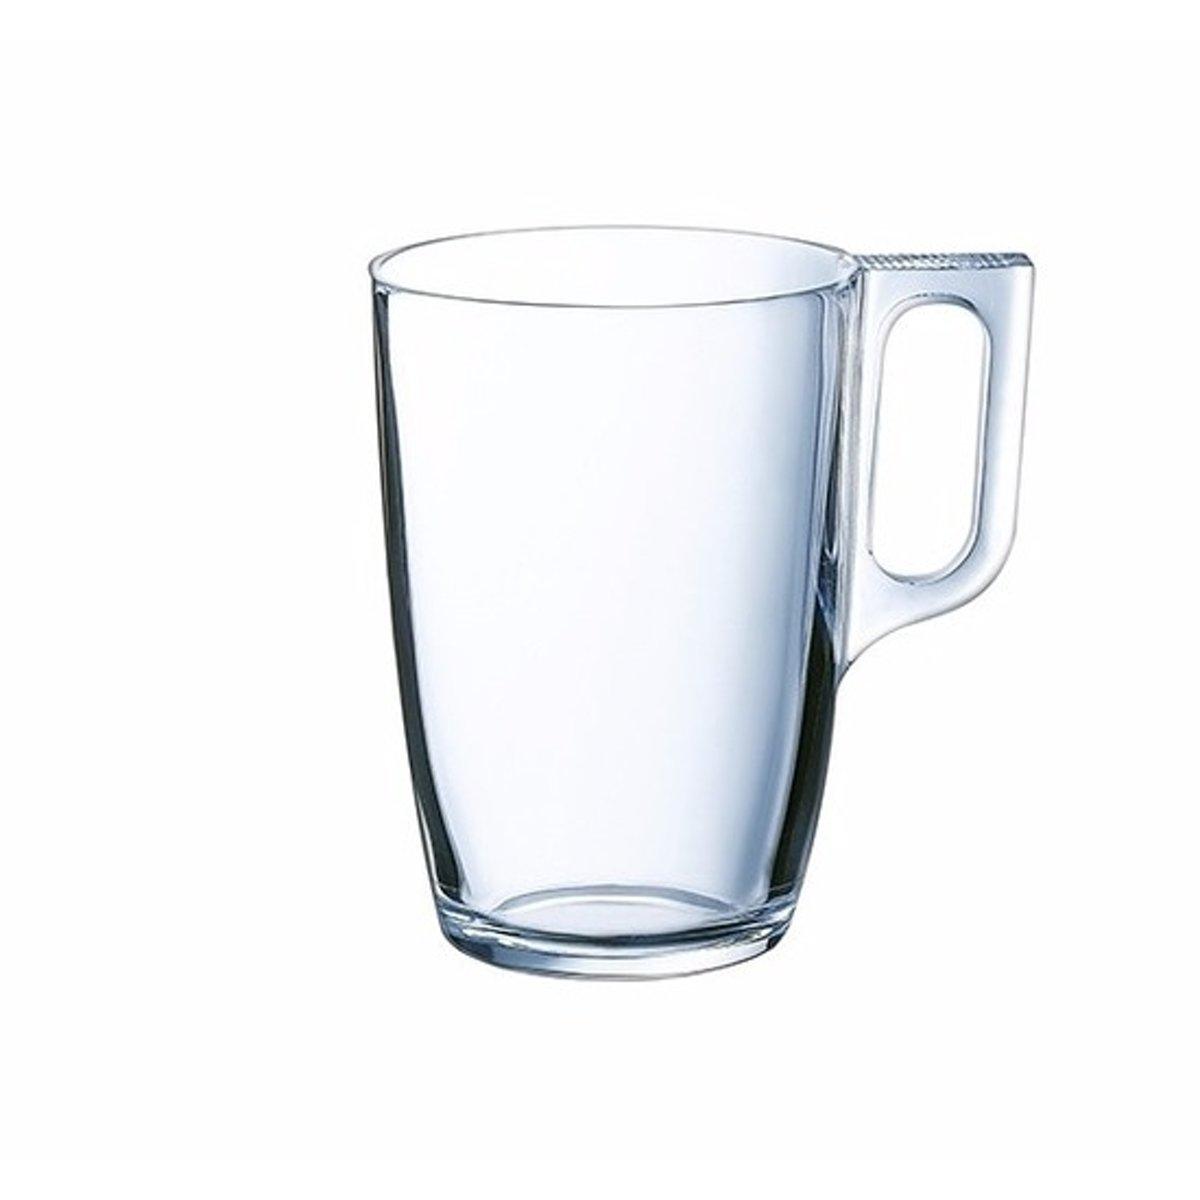 Welp bol.com | Thee glas/beker 320 ml ML-68